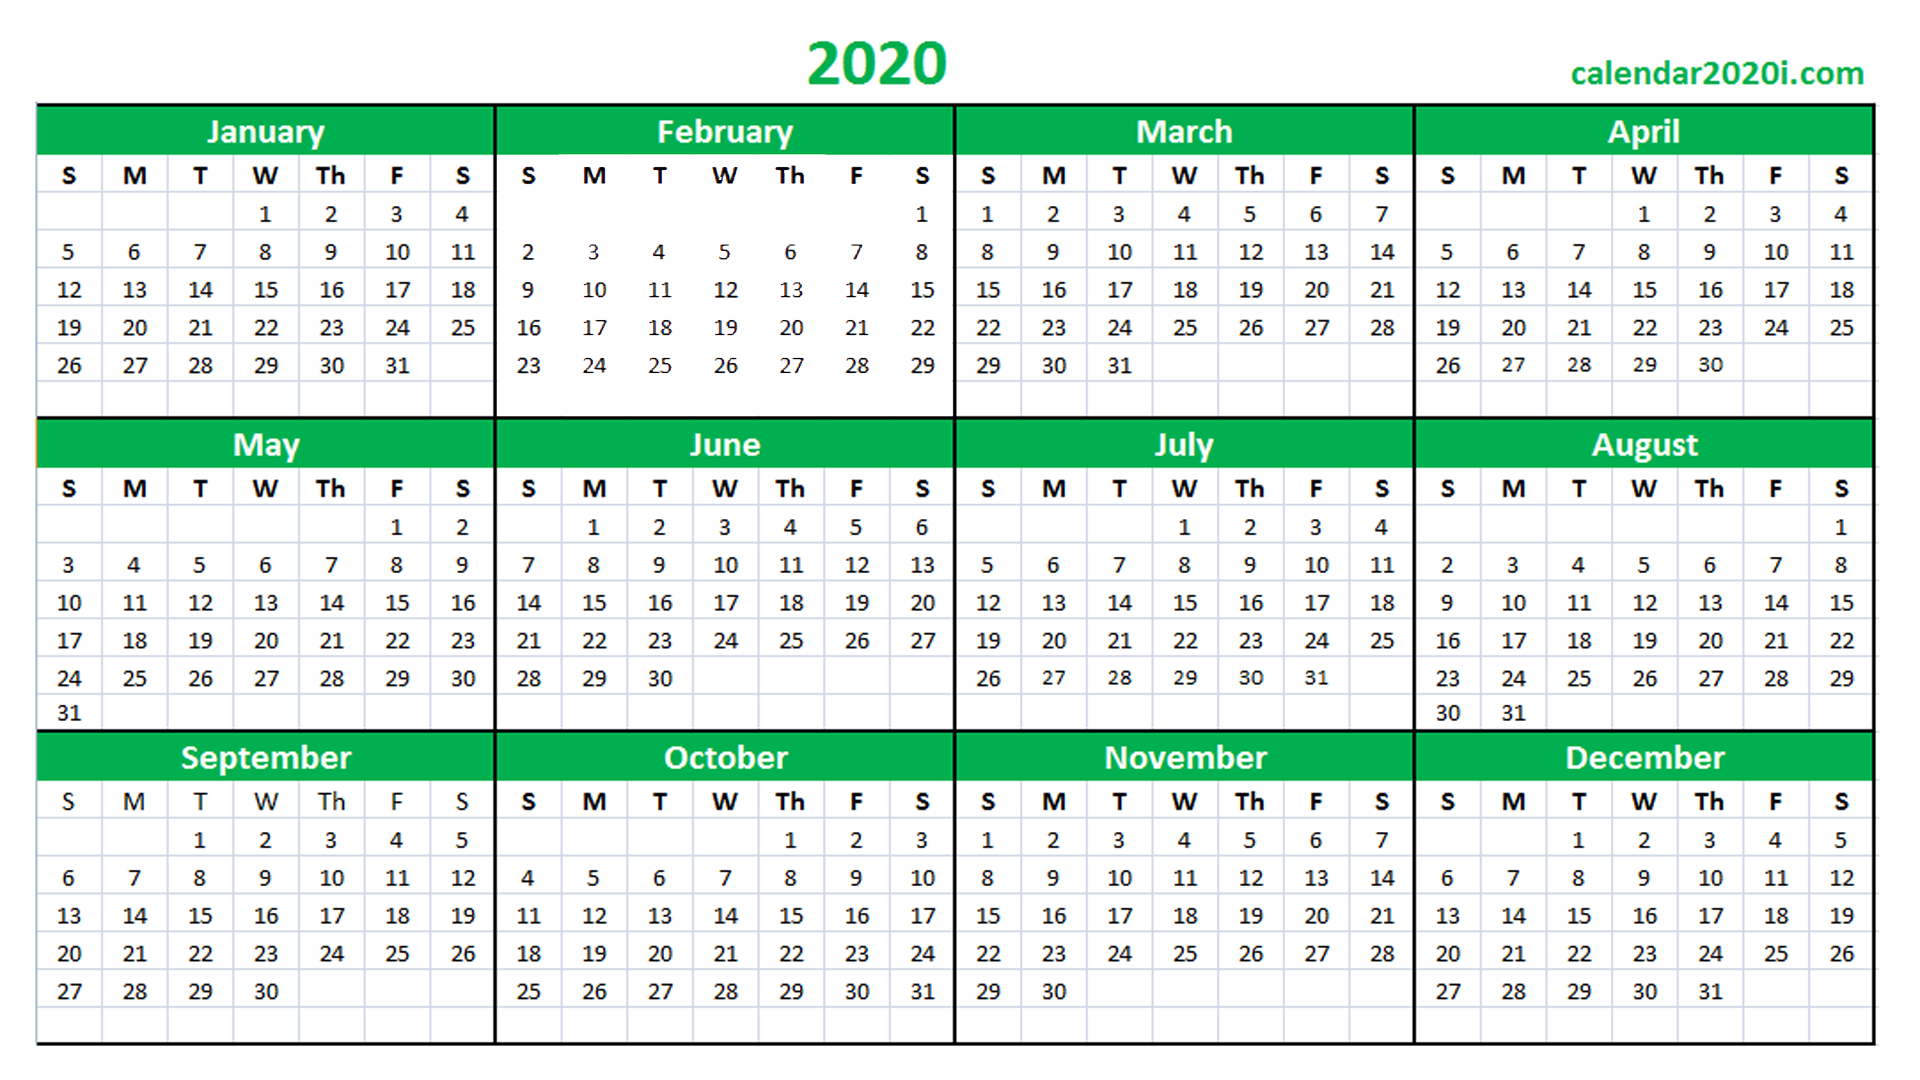 Blank 2020 Calendar Printable Templates | Calendar 2020 with 2020 Excel Calender